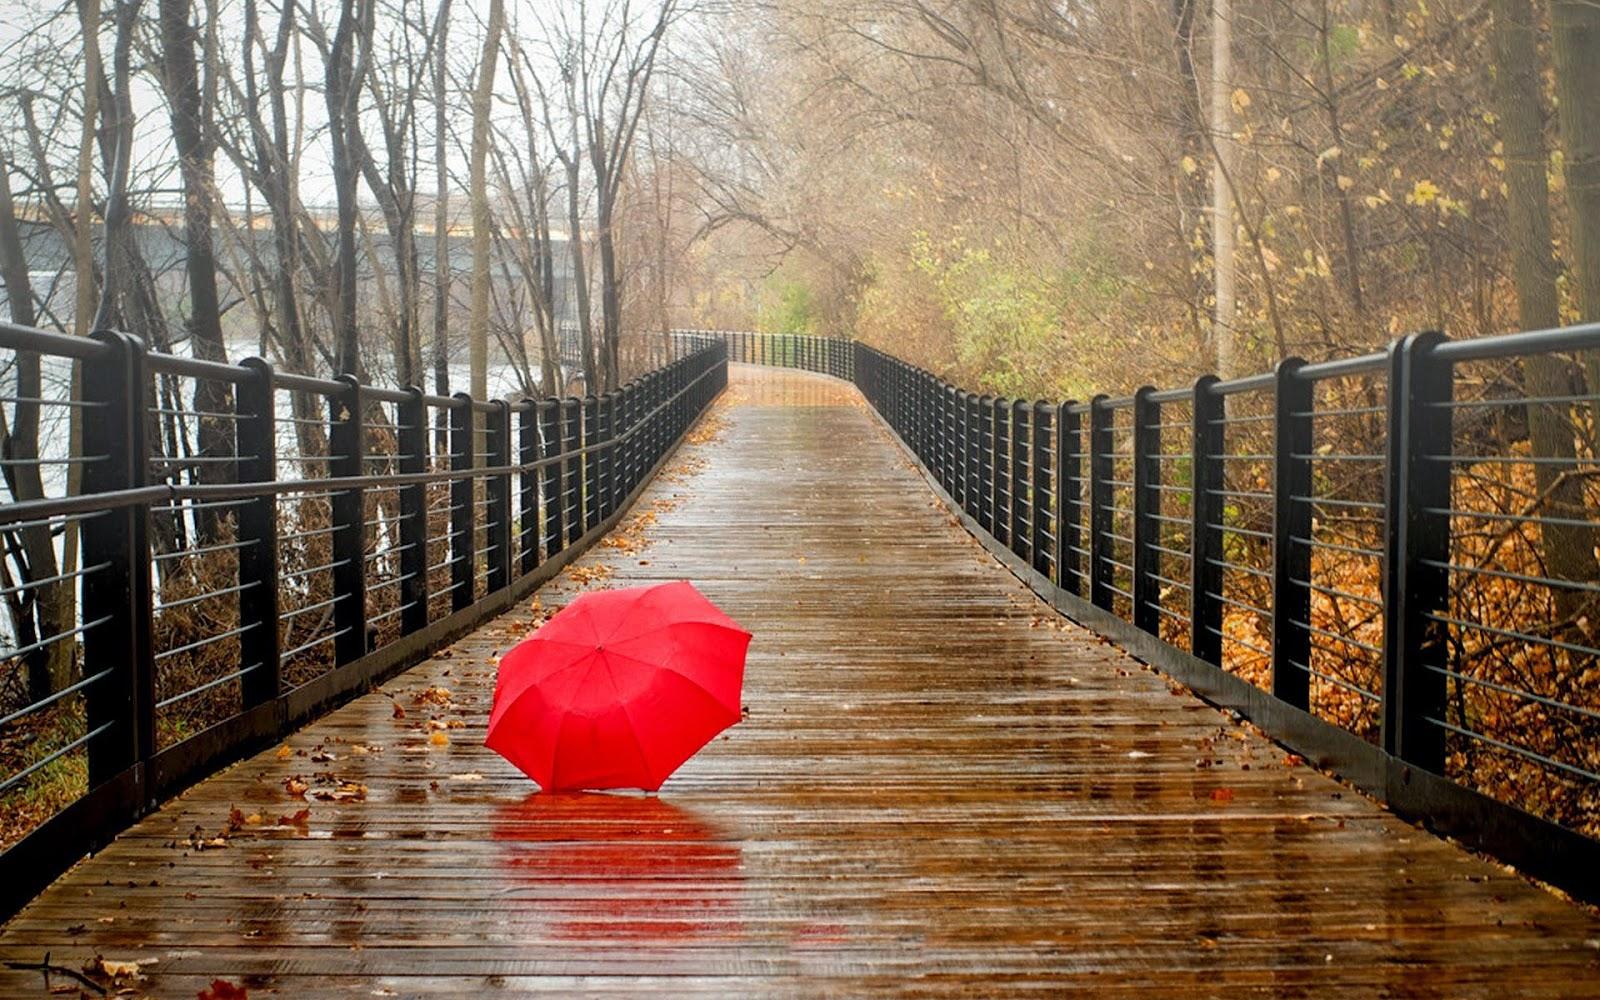 Cozy Fall Hd Wallpaper 5 000 Free Rainy Day Music Playlists 8tracks Radio